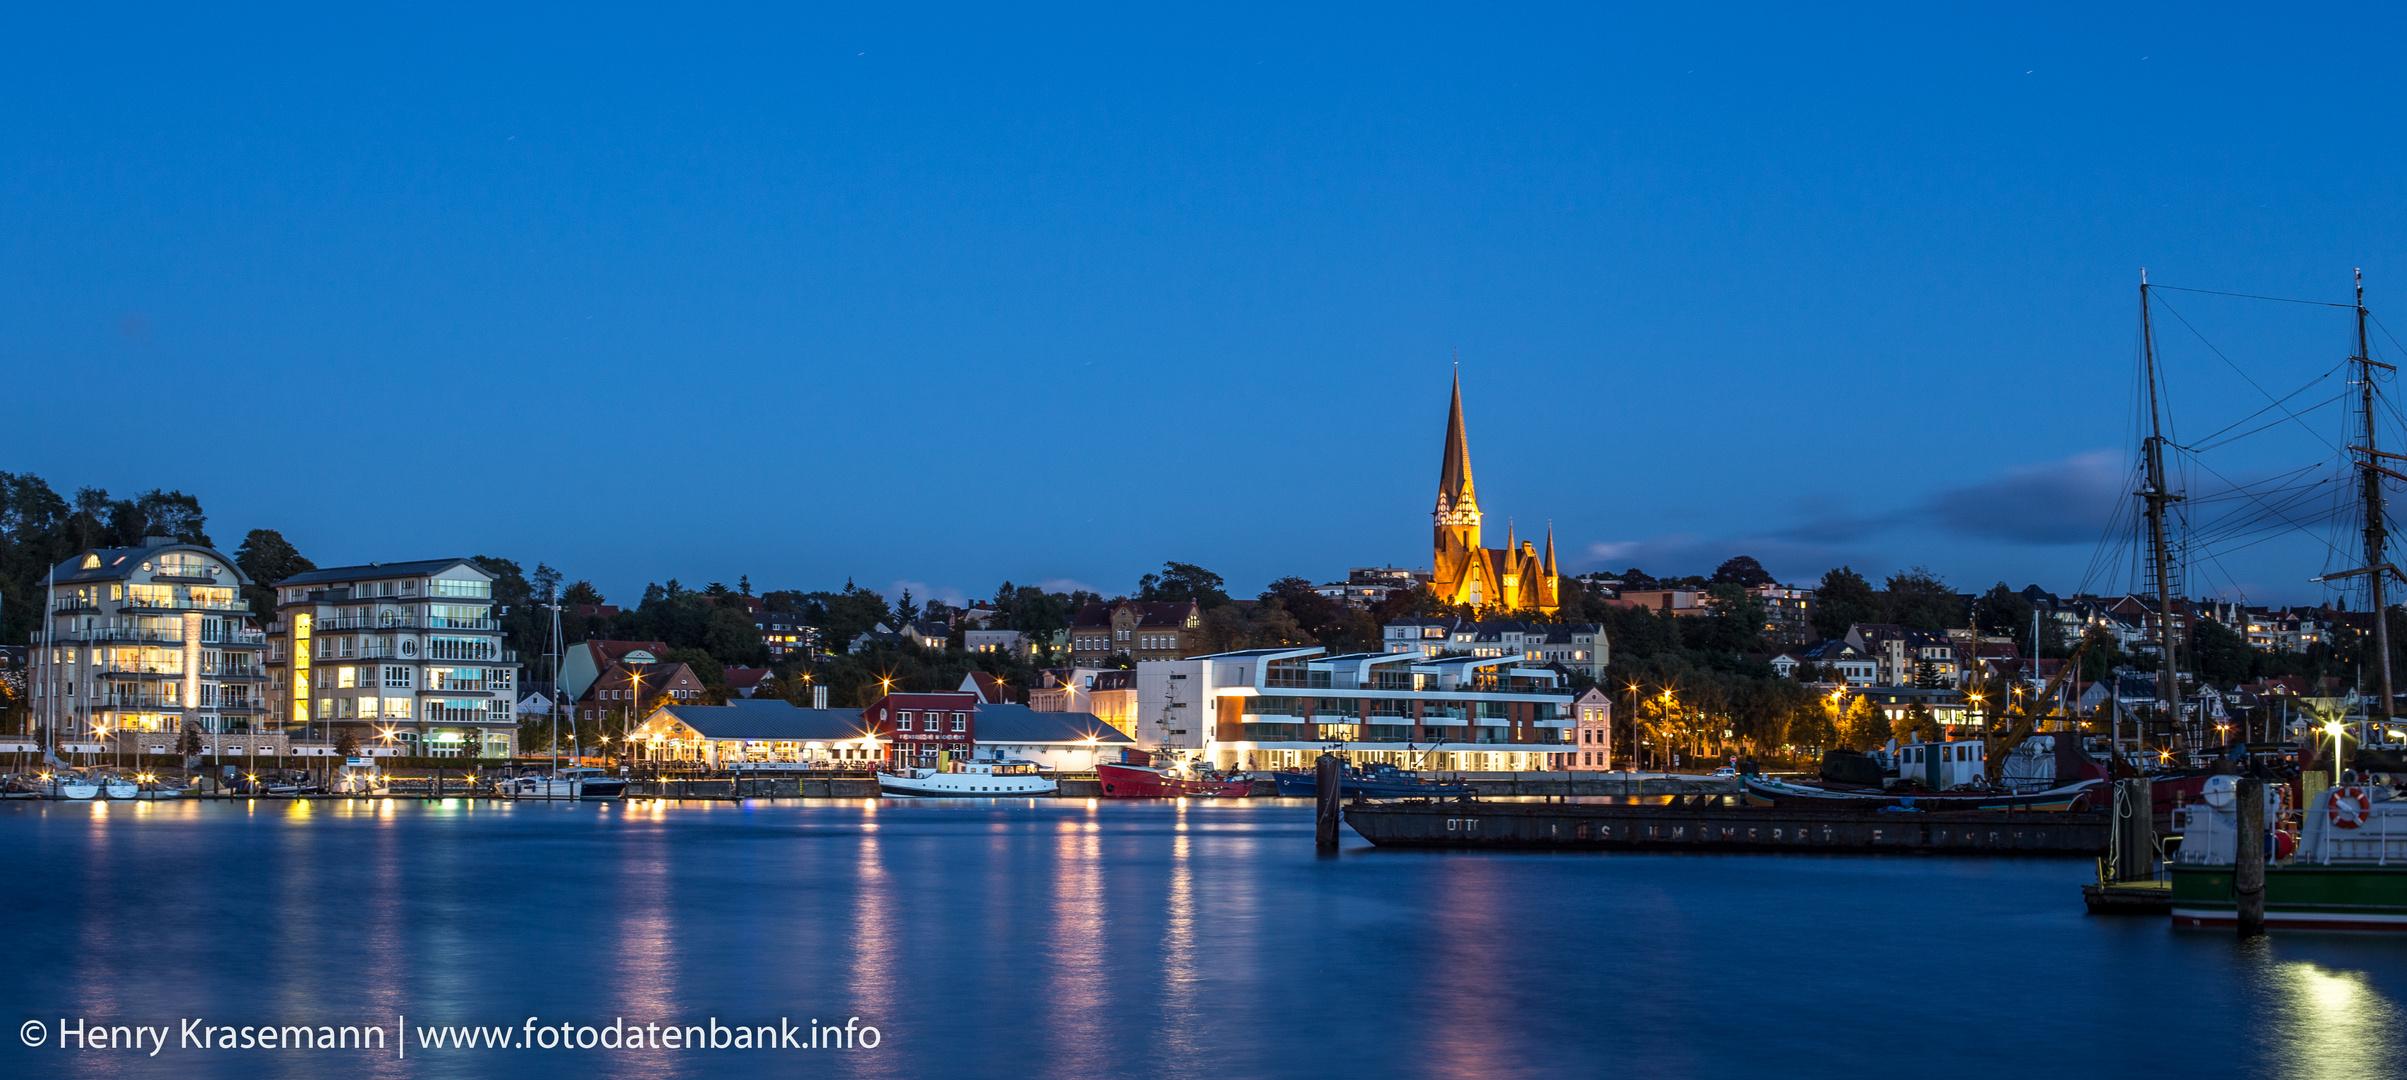 Flensburger Förde bei anbrechender Nacht